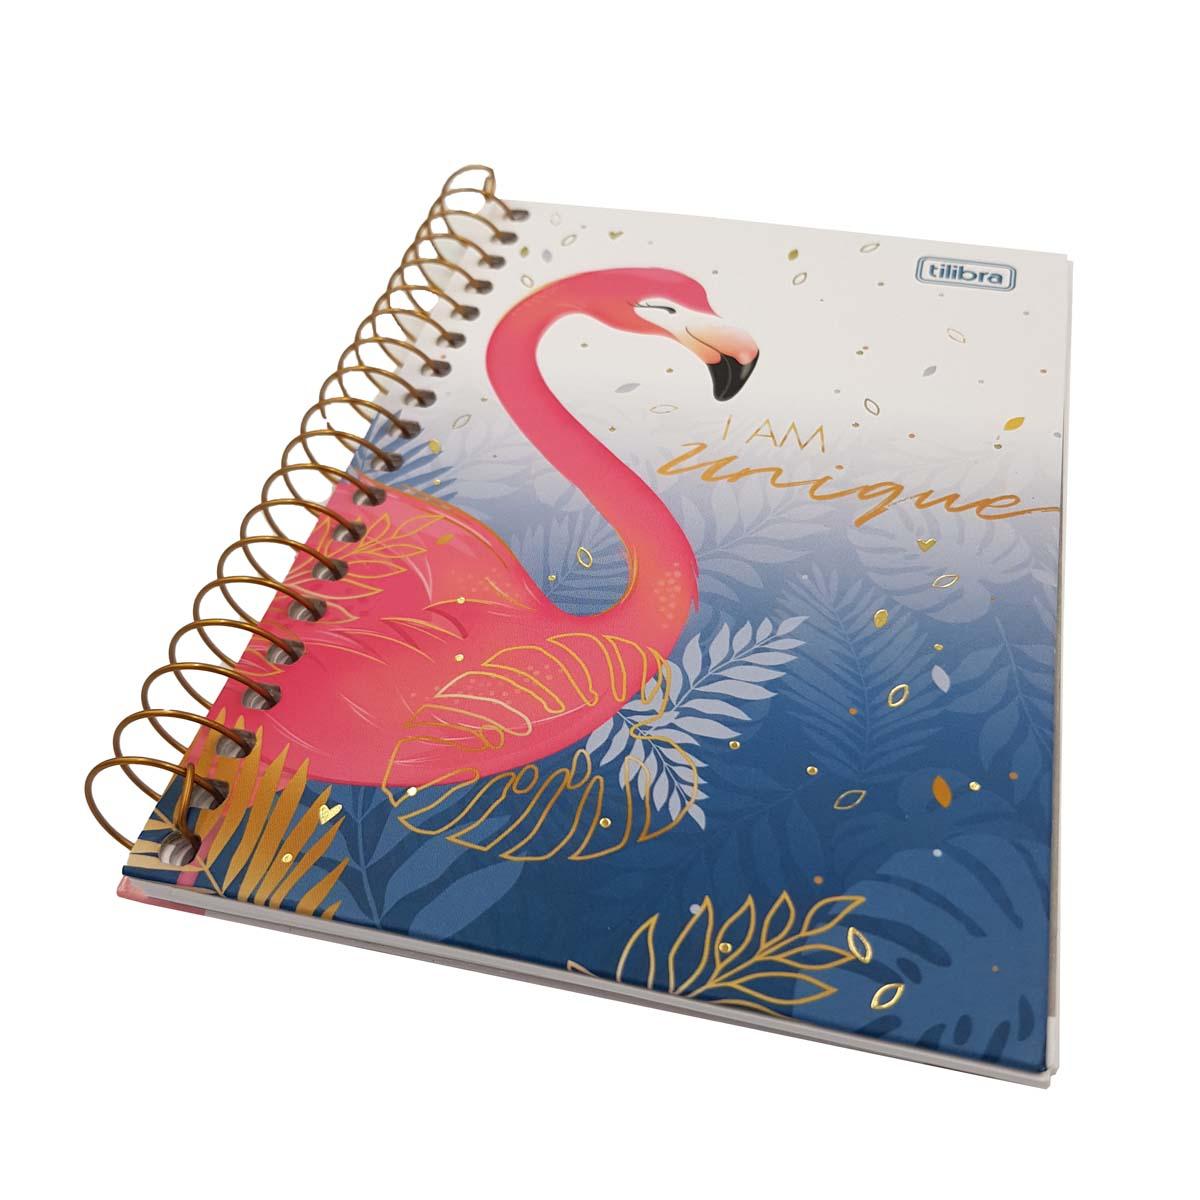 eanxCaderneta Capa Dura Espiral 80 folhas 110 x 154mm 56g/m2 Flamingo Rosa